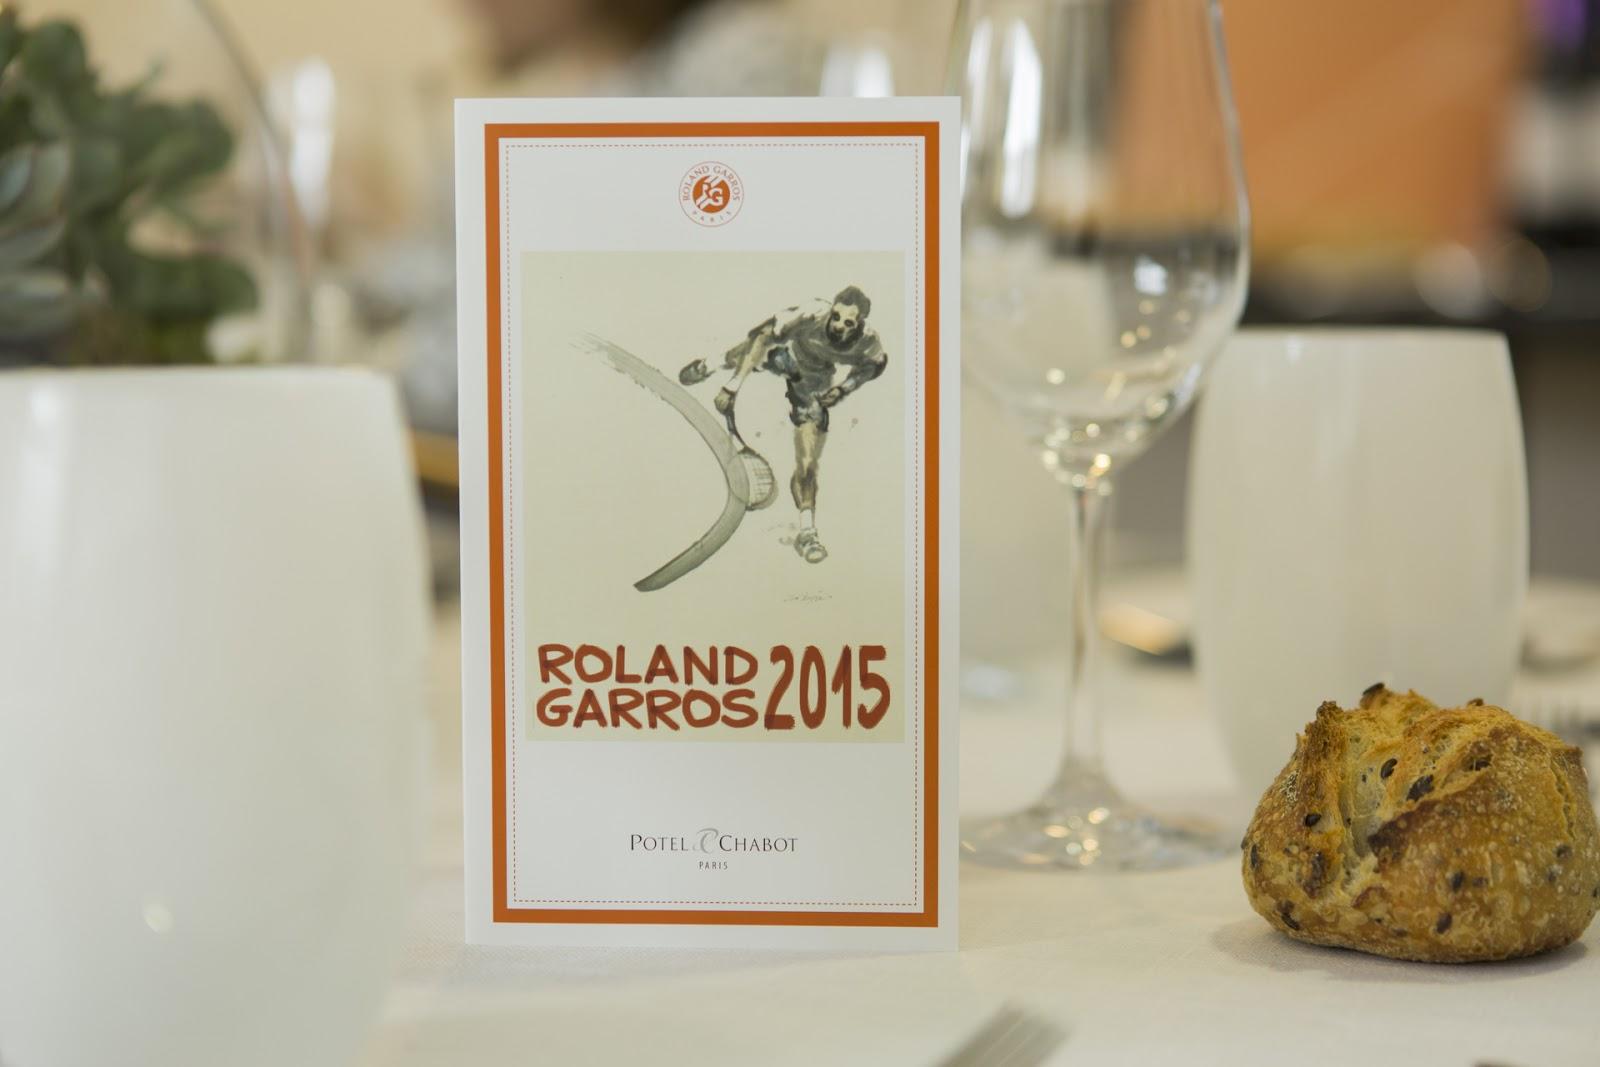 Roland Garros Potel et Chabot Menu